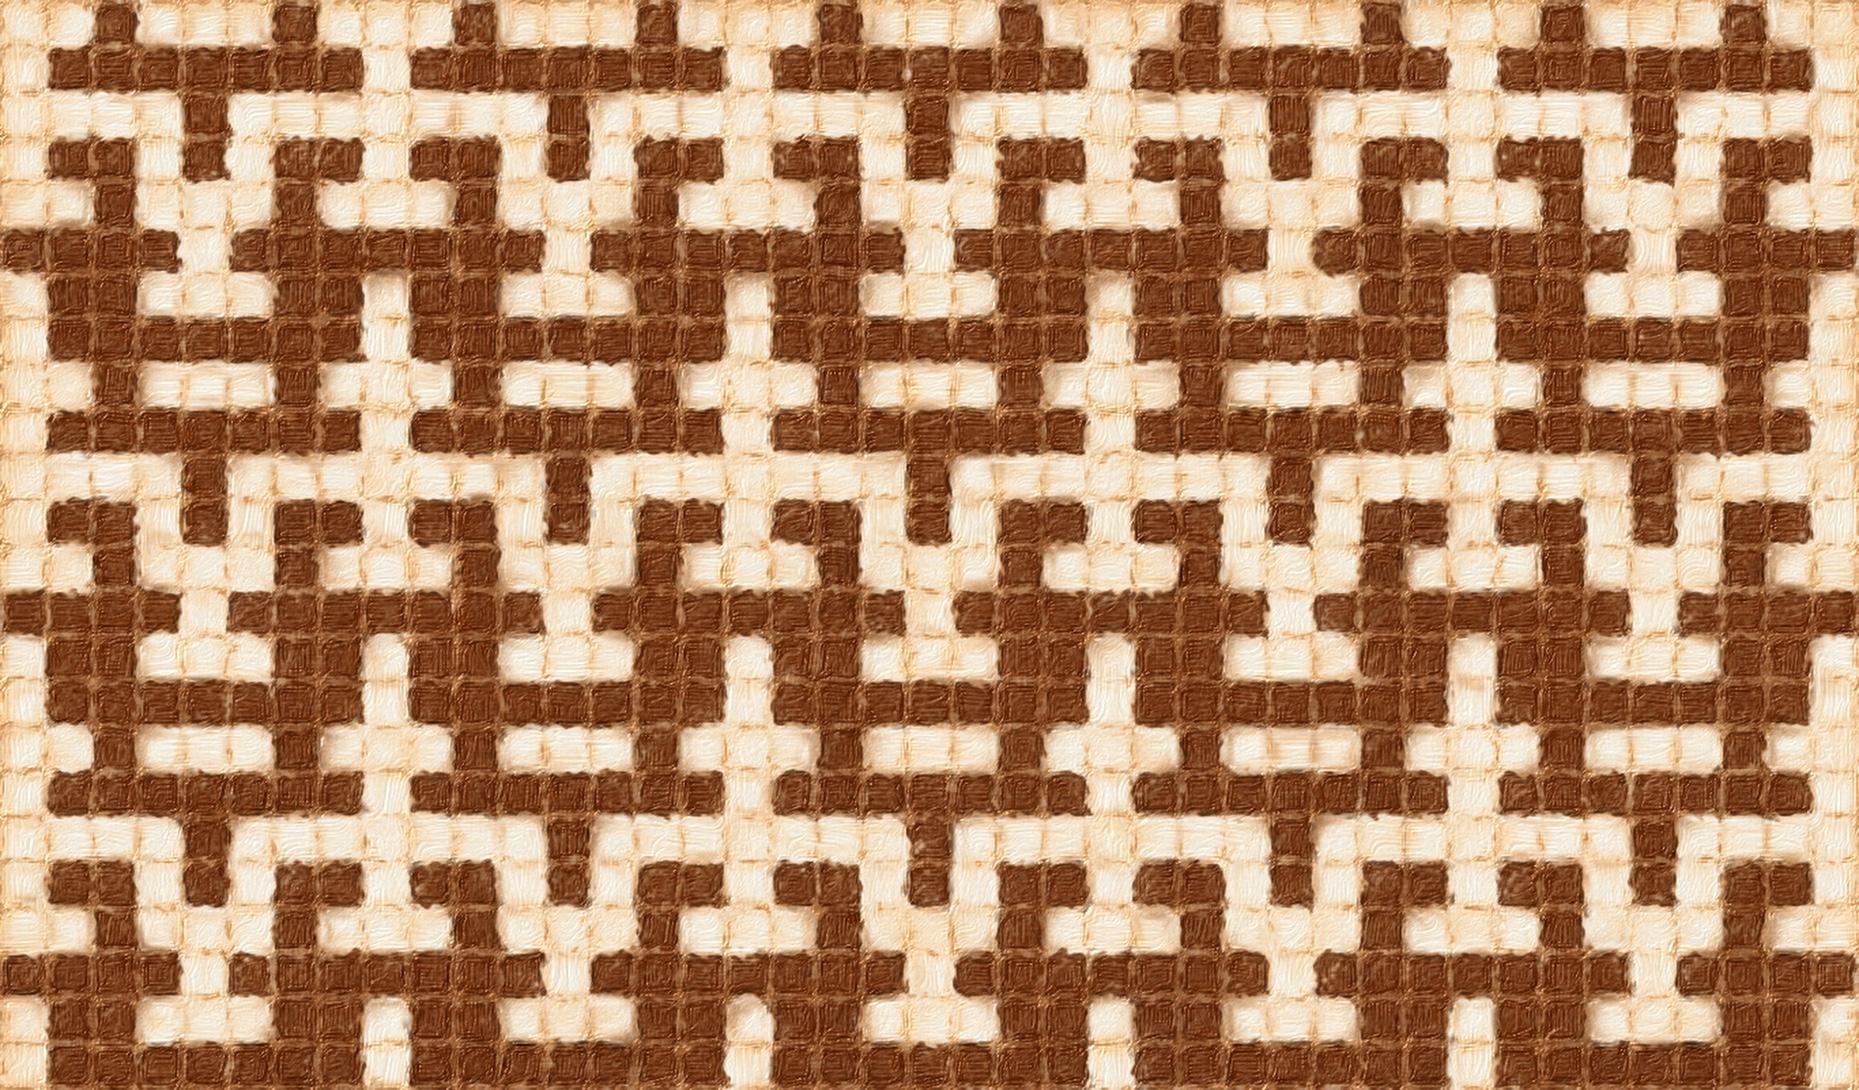 Verve mosaic knitting chart as an allover pattern